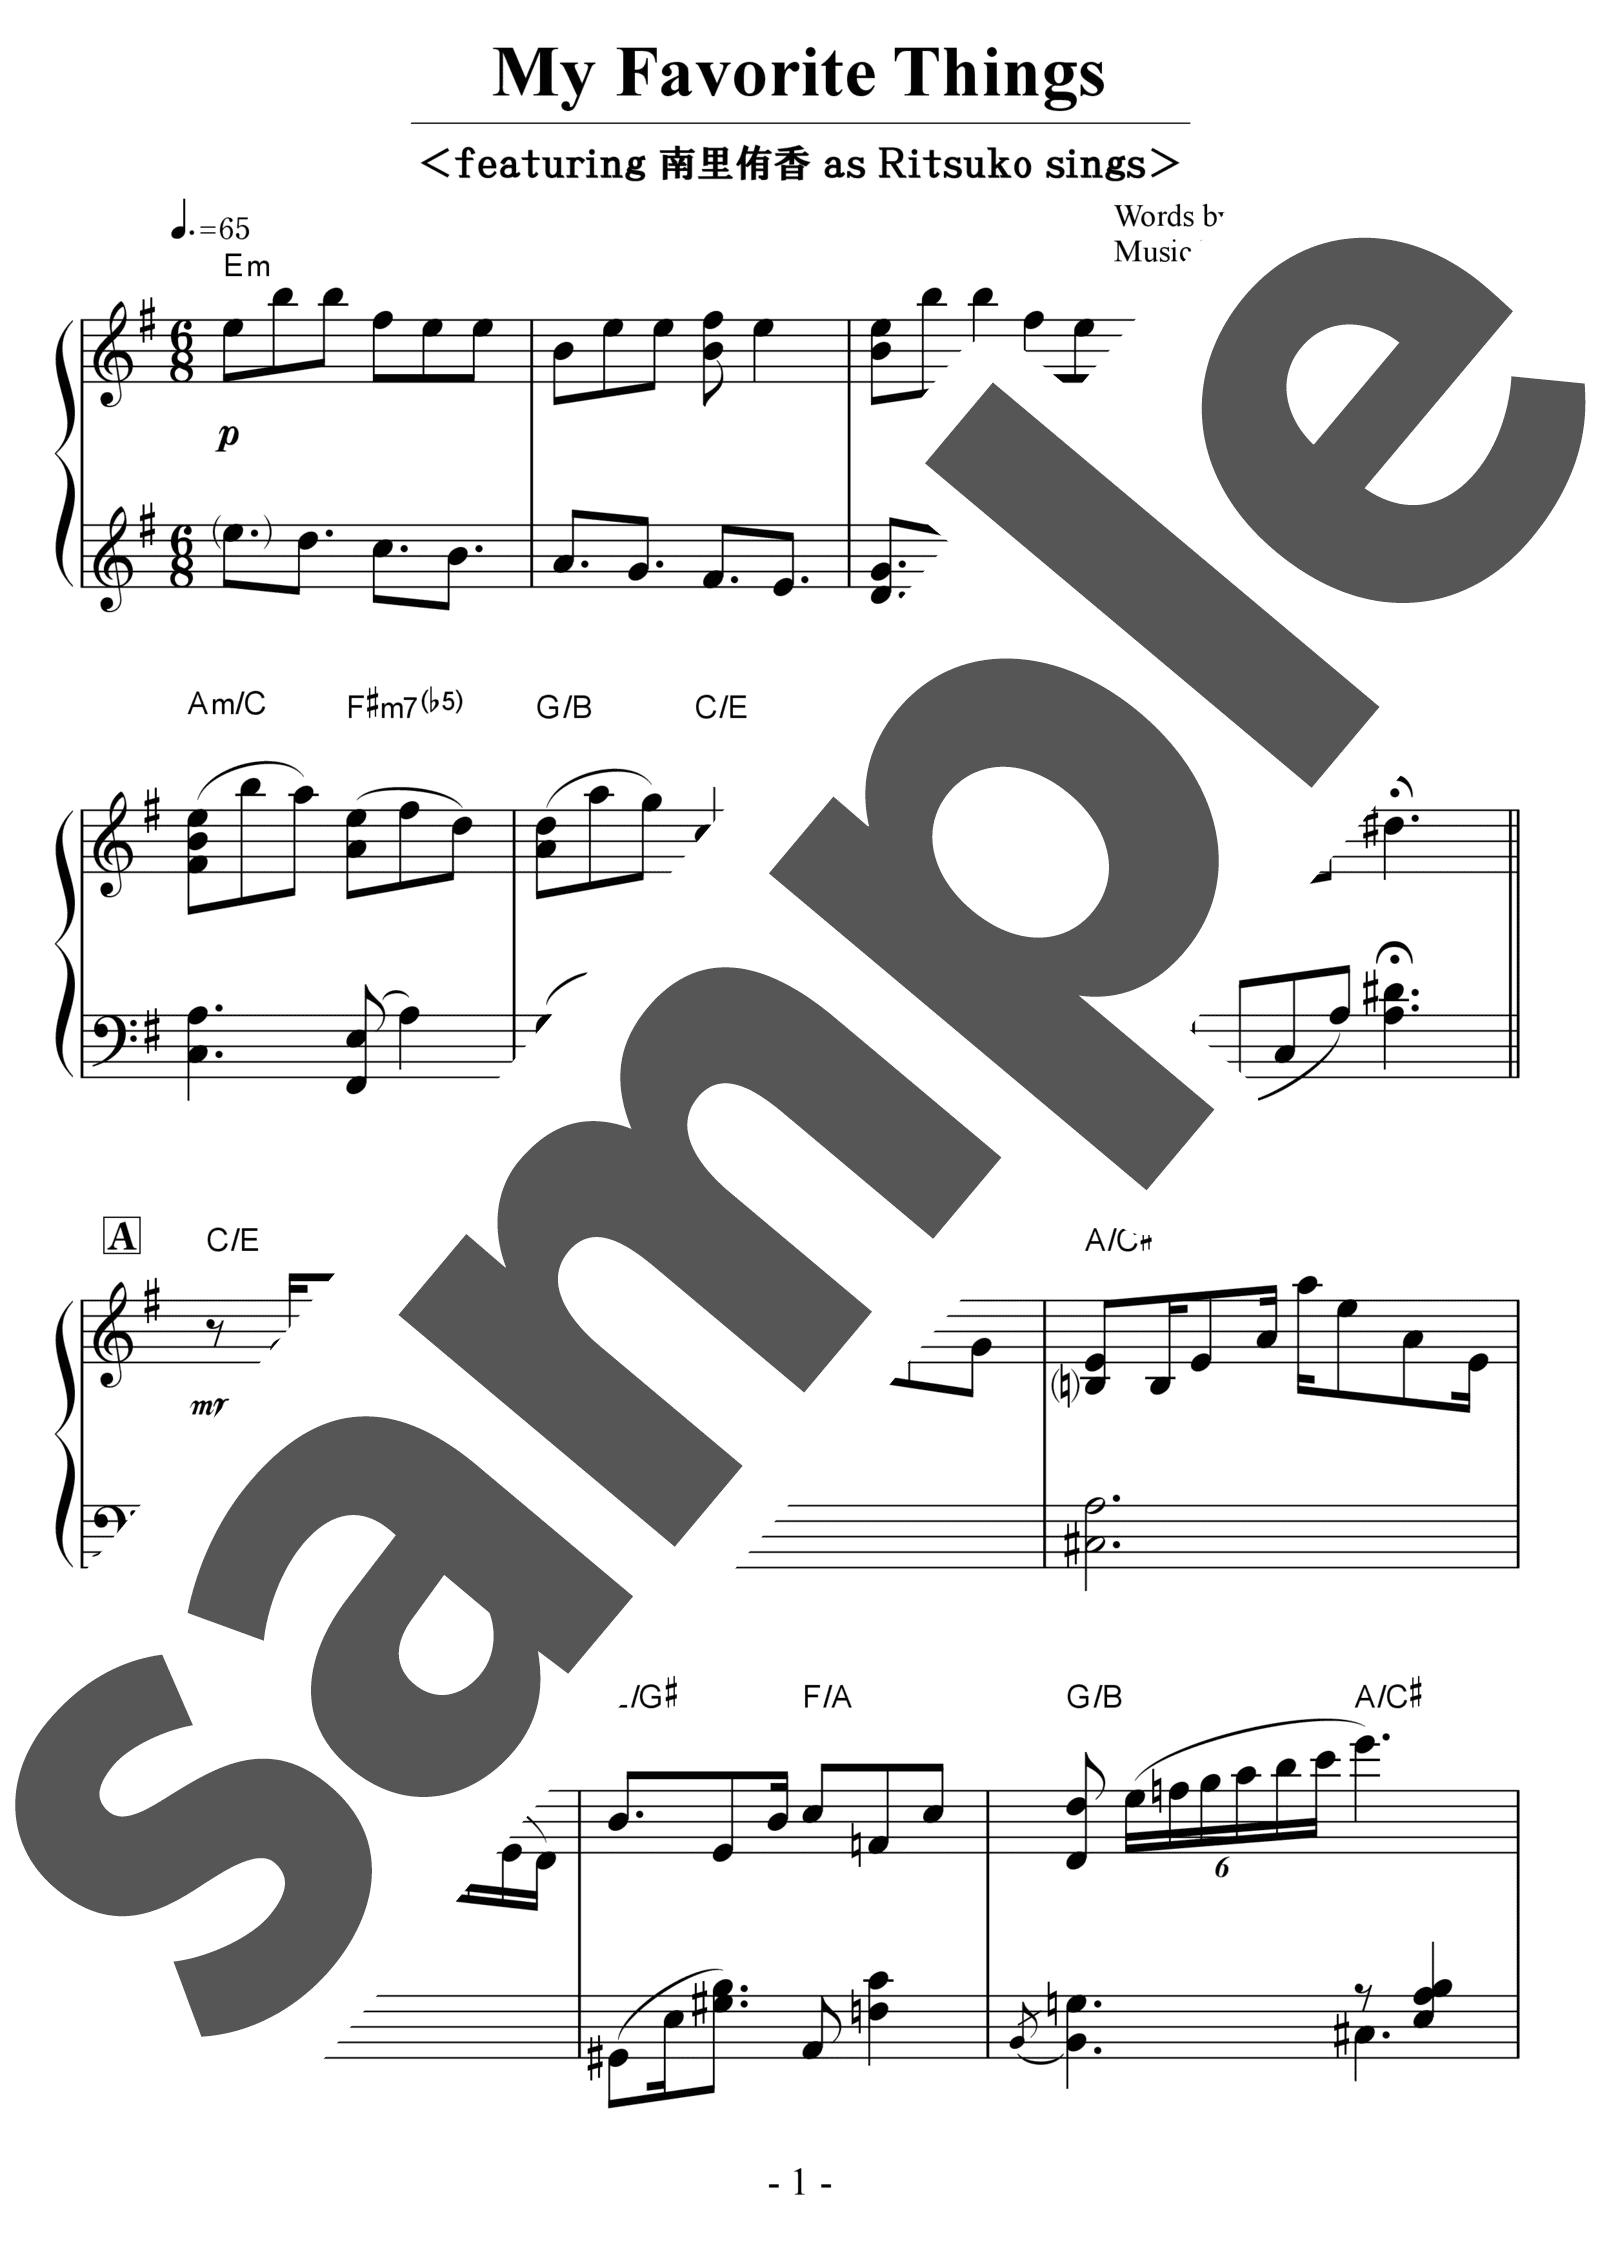 「My Favorite Things」のサンプル楽譜